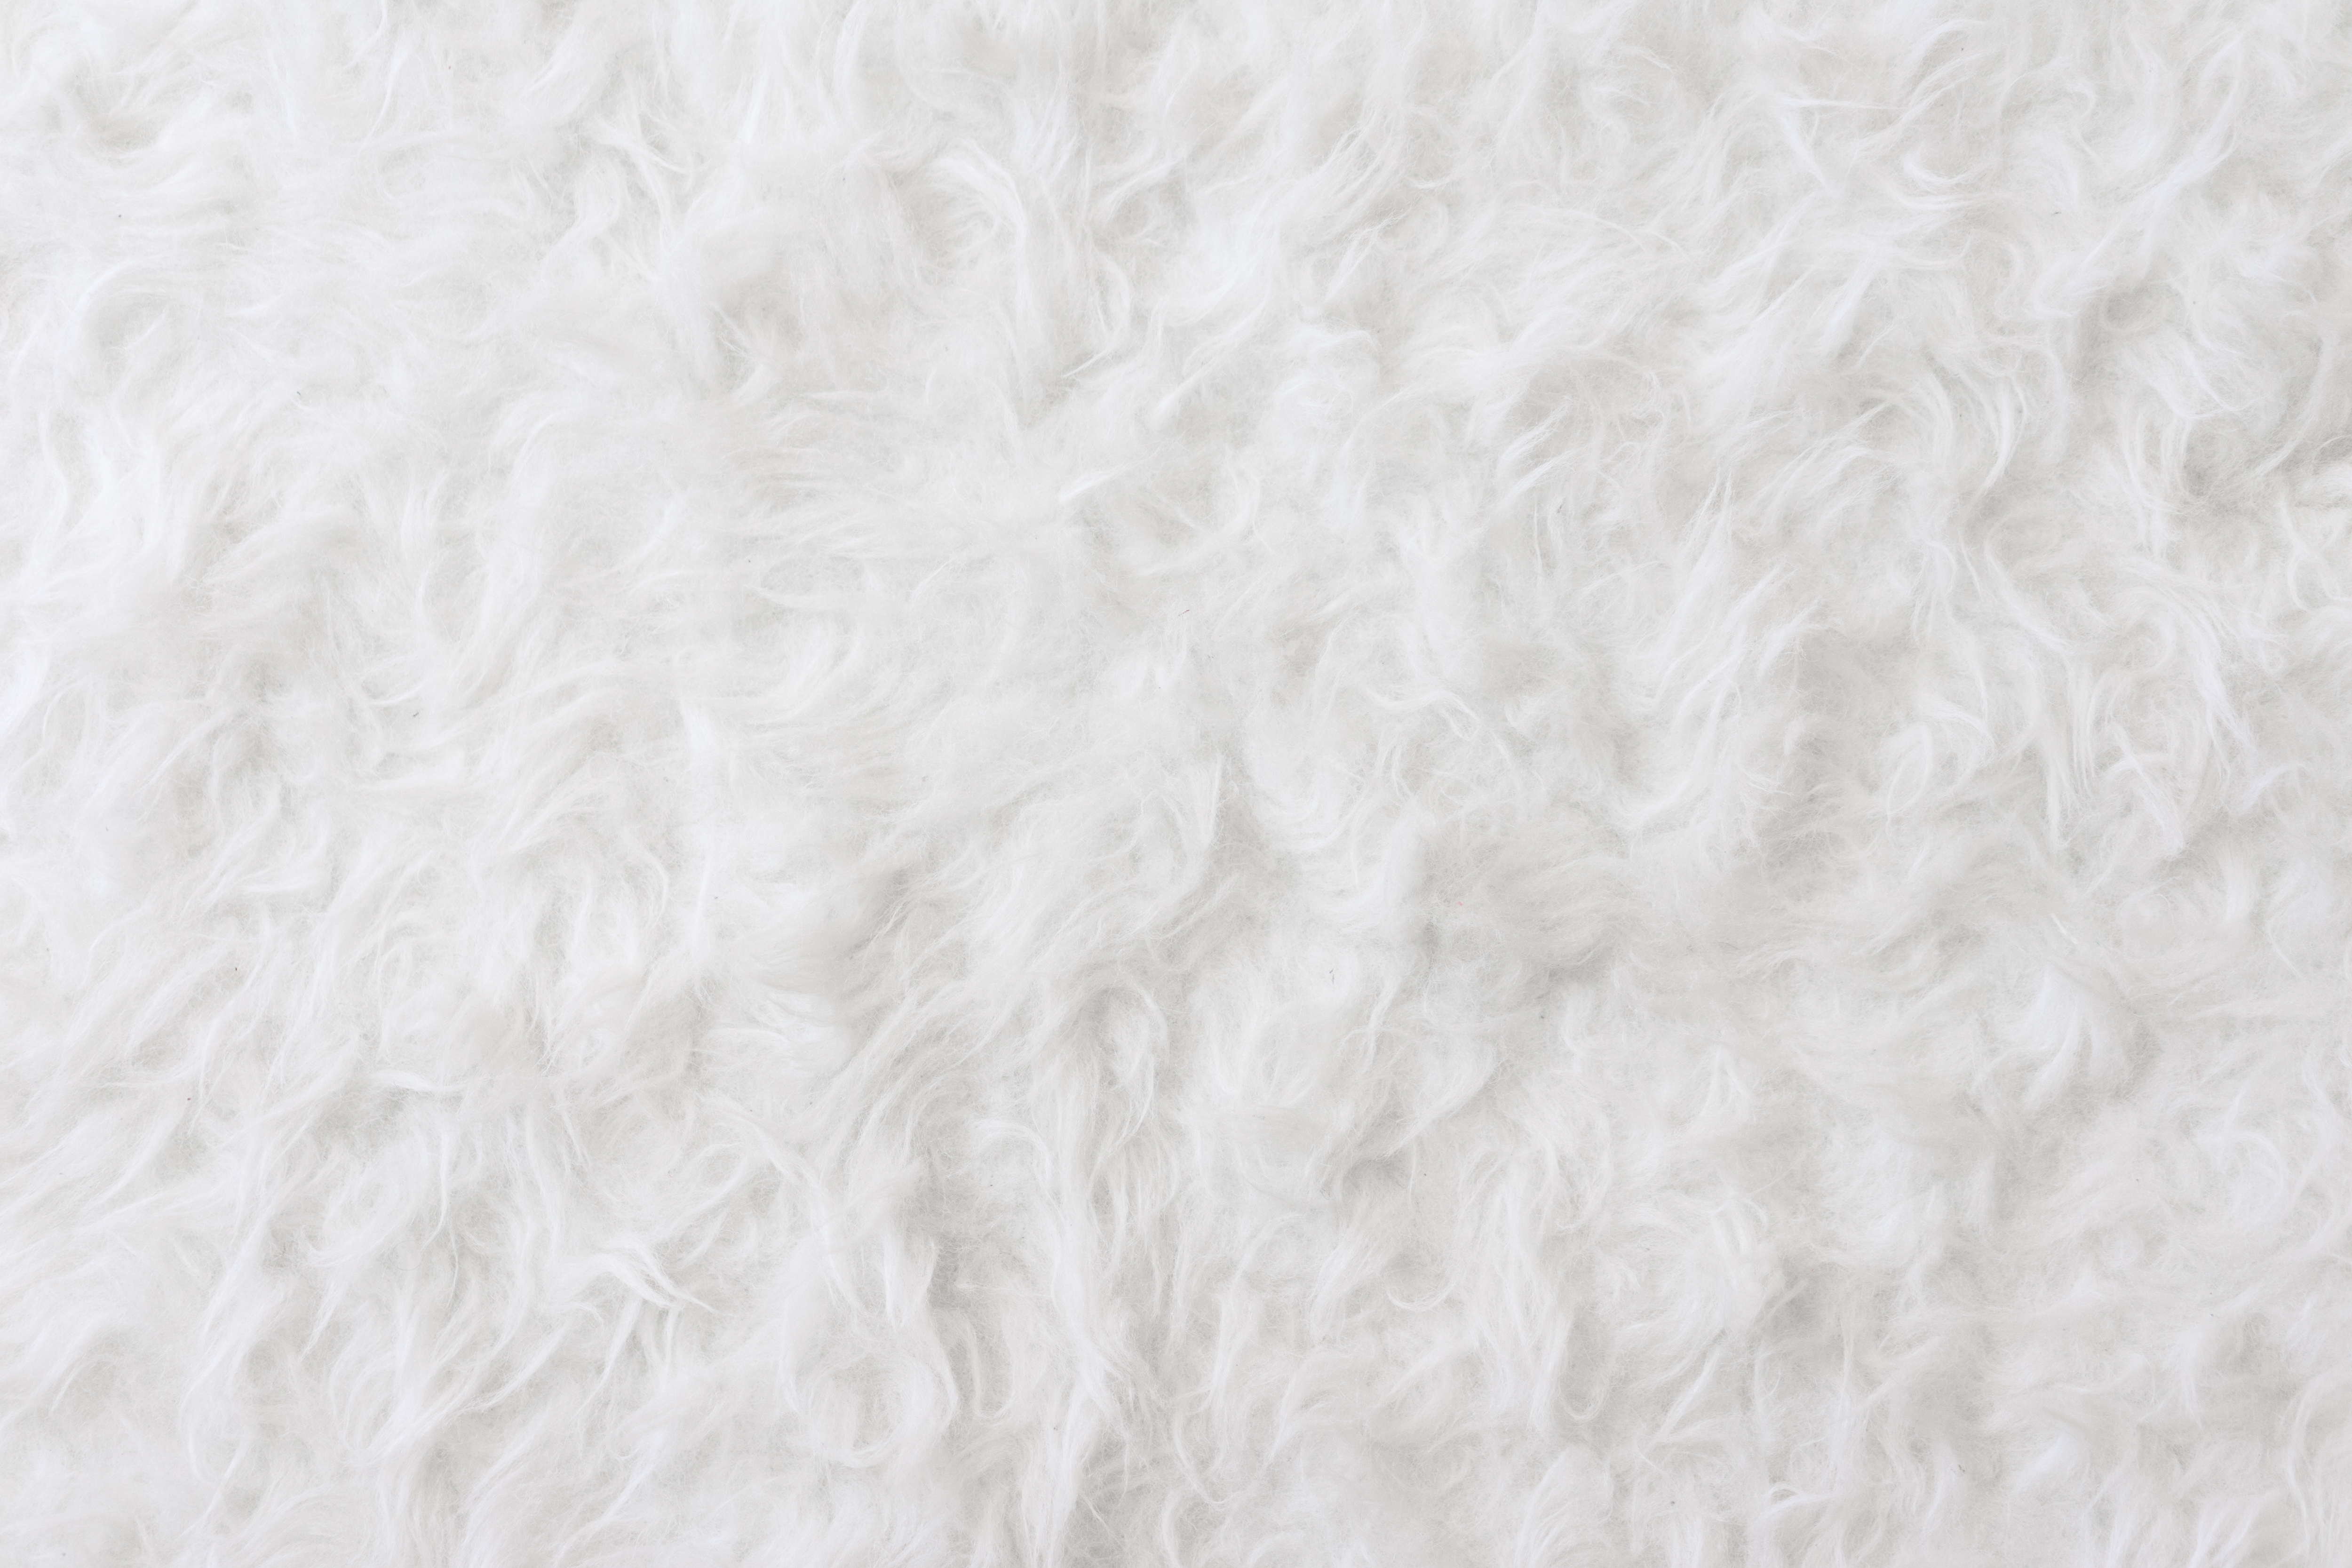 white-eco-fur-pattern-background-picjumbo-com.jpg